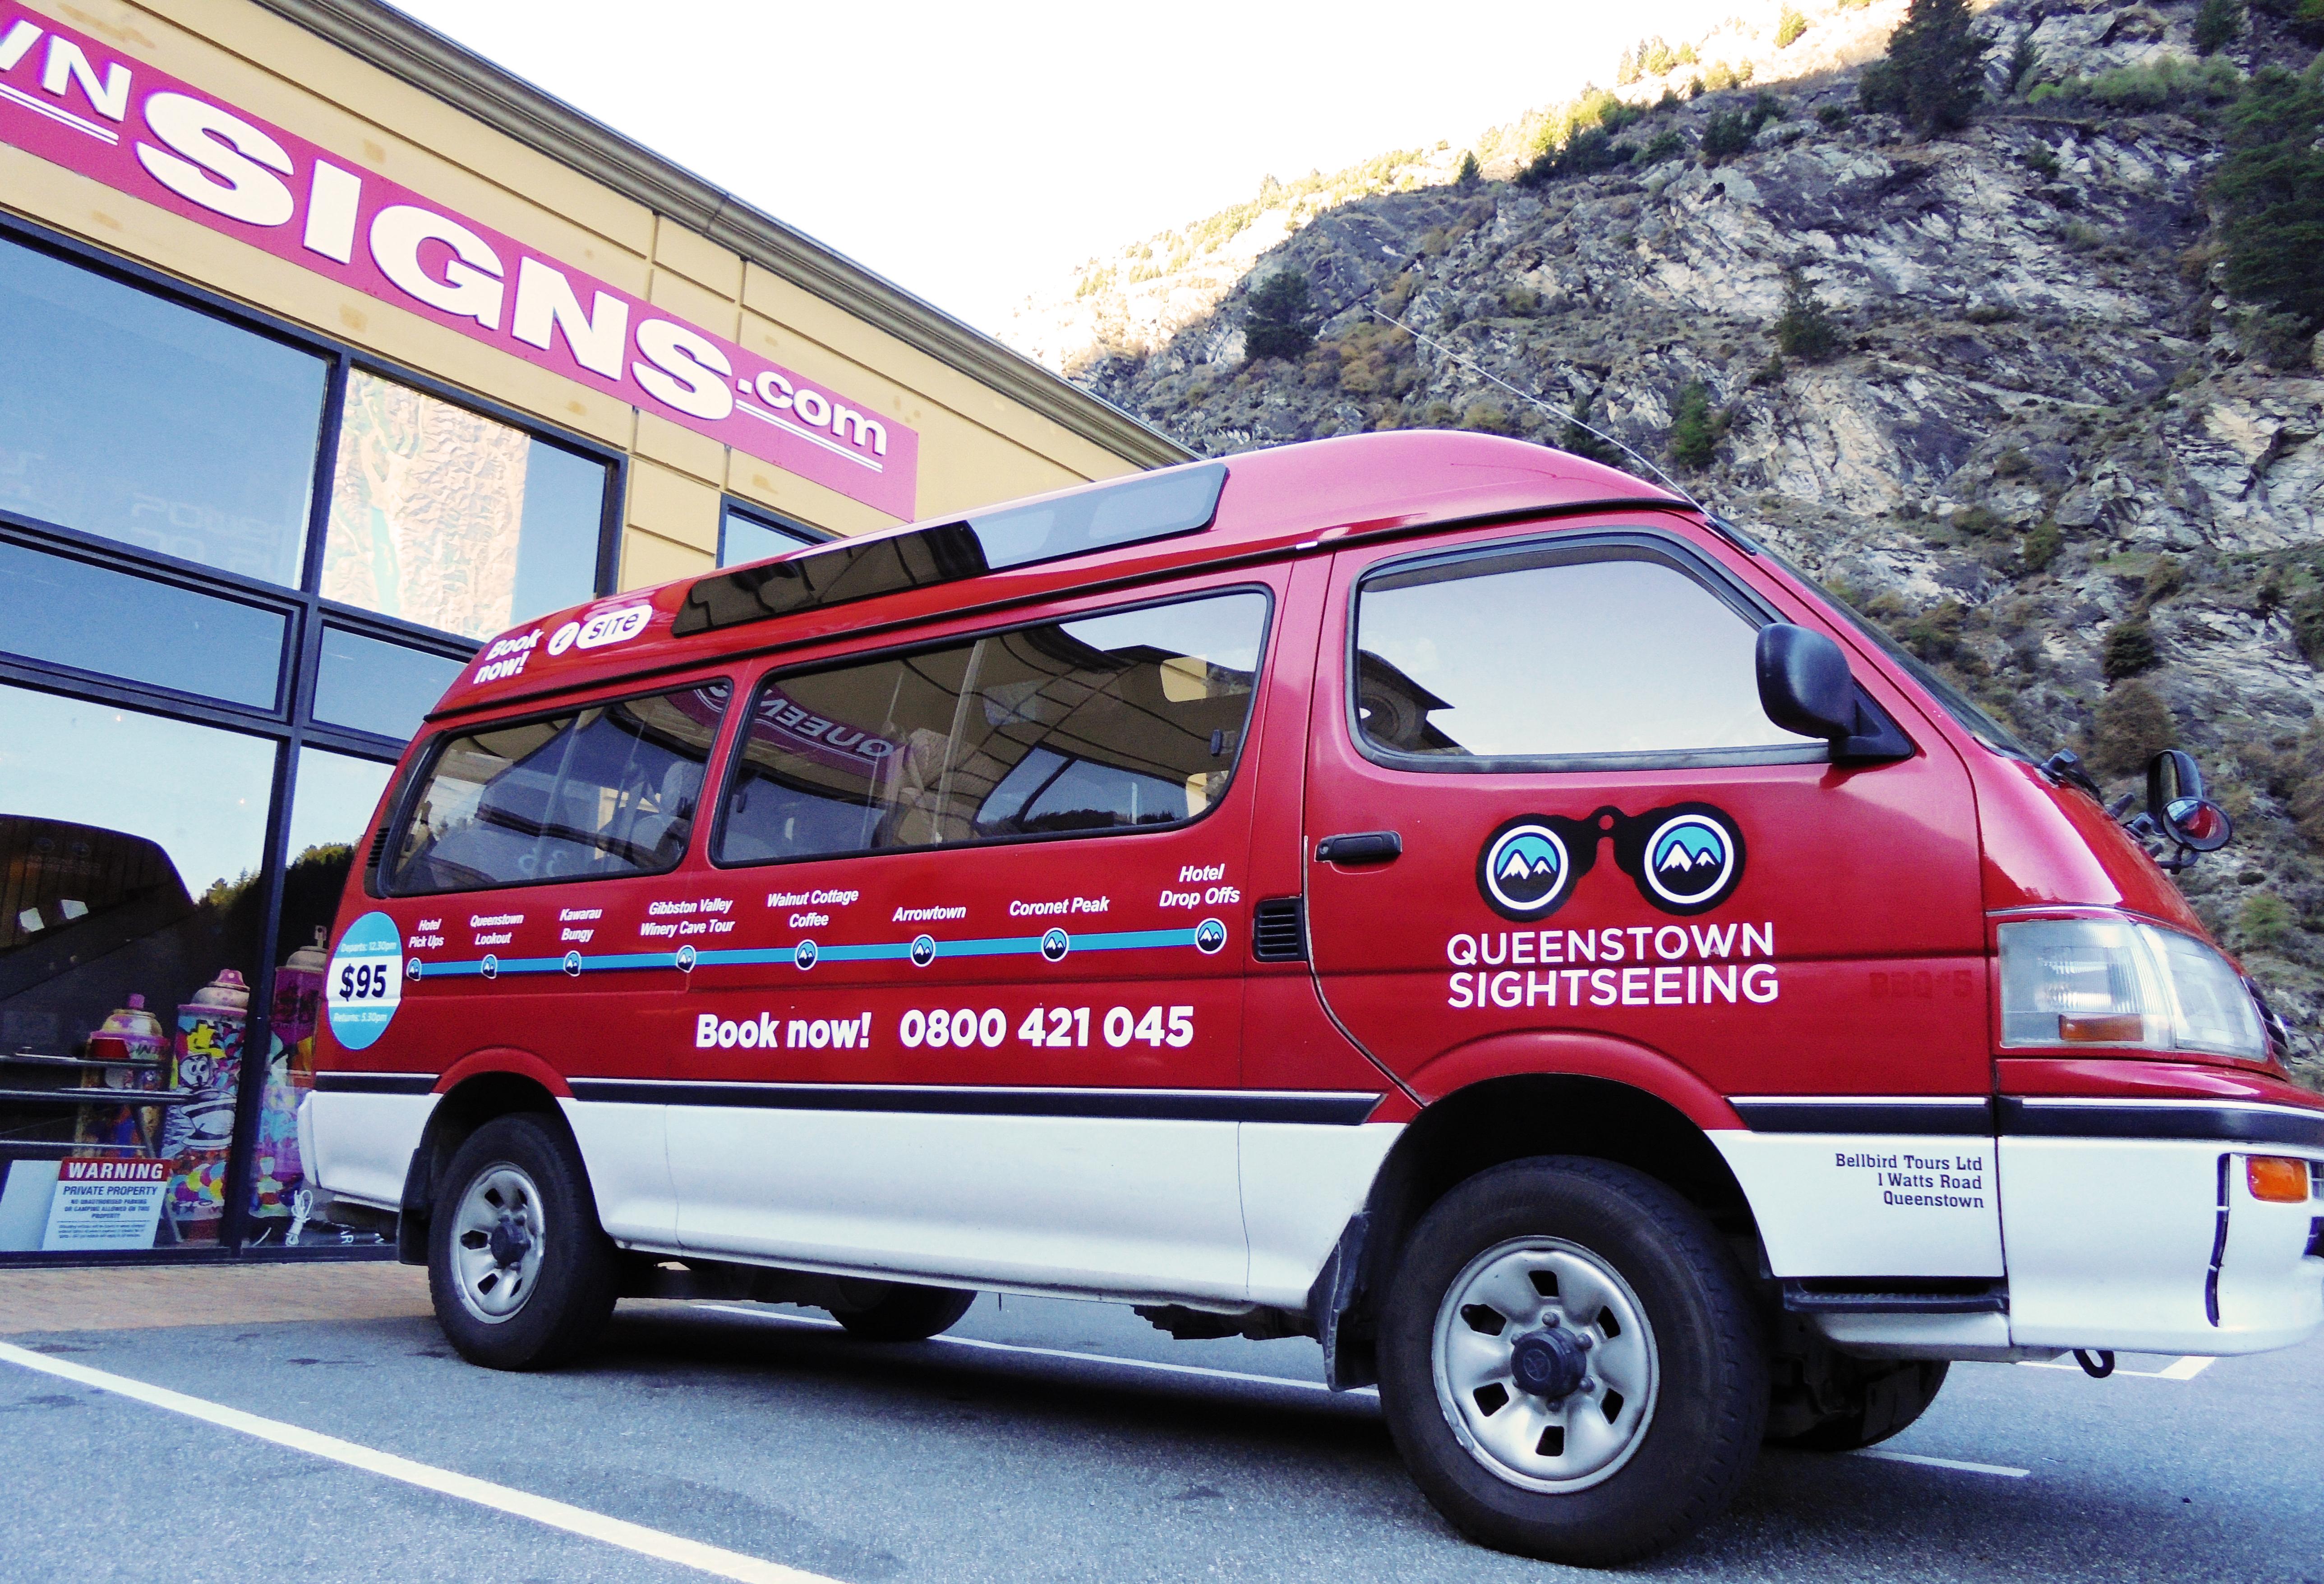 QT Sightseeing Van